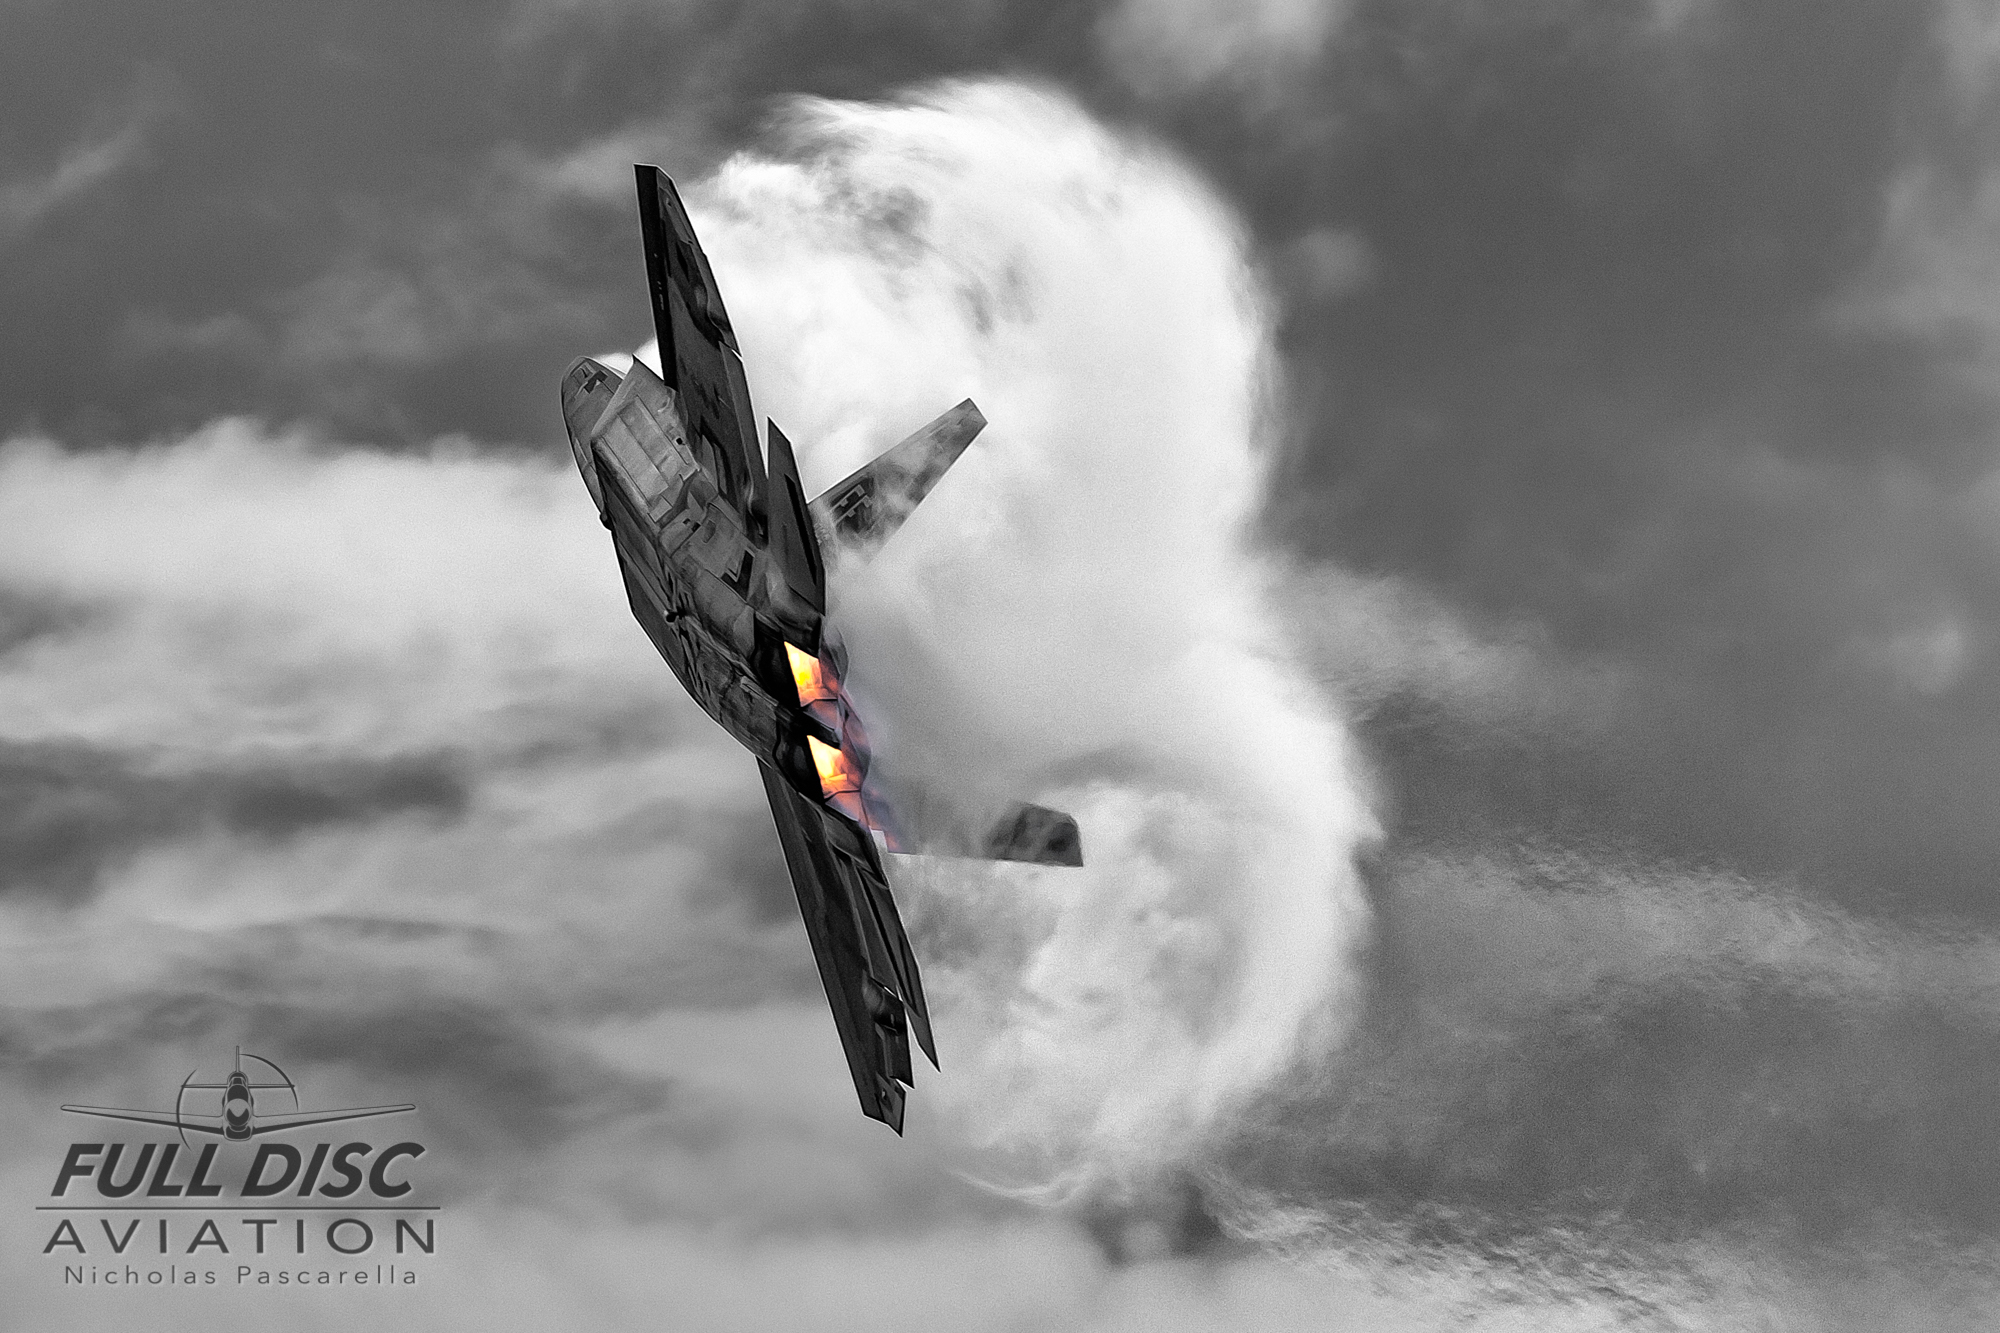 nickpascarella_nicholaspascarella_fulldiscaviation_aircraft_f22raptor_vapor.jpg